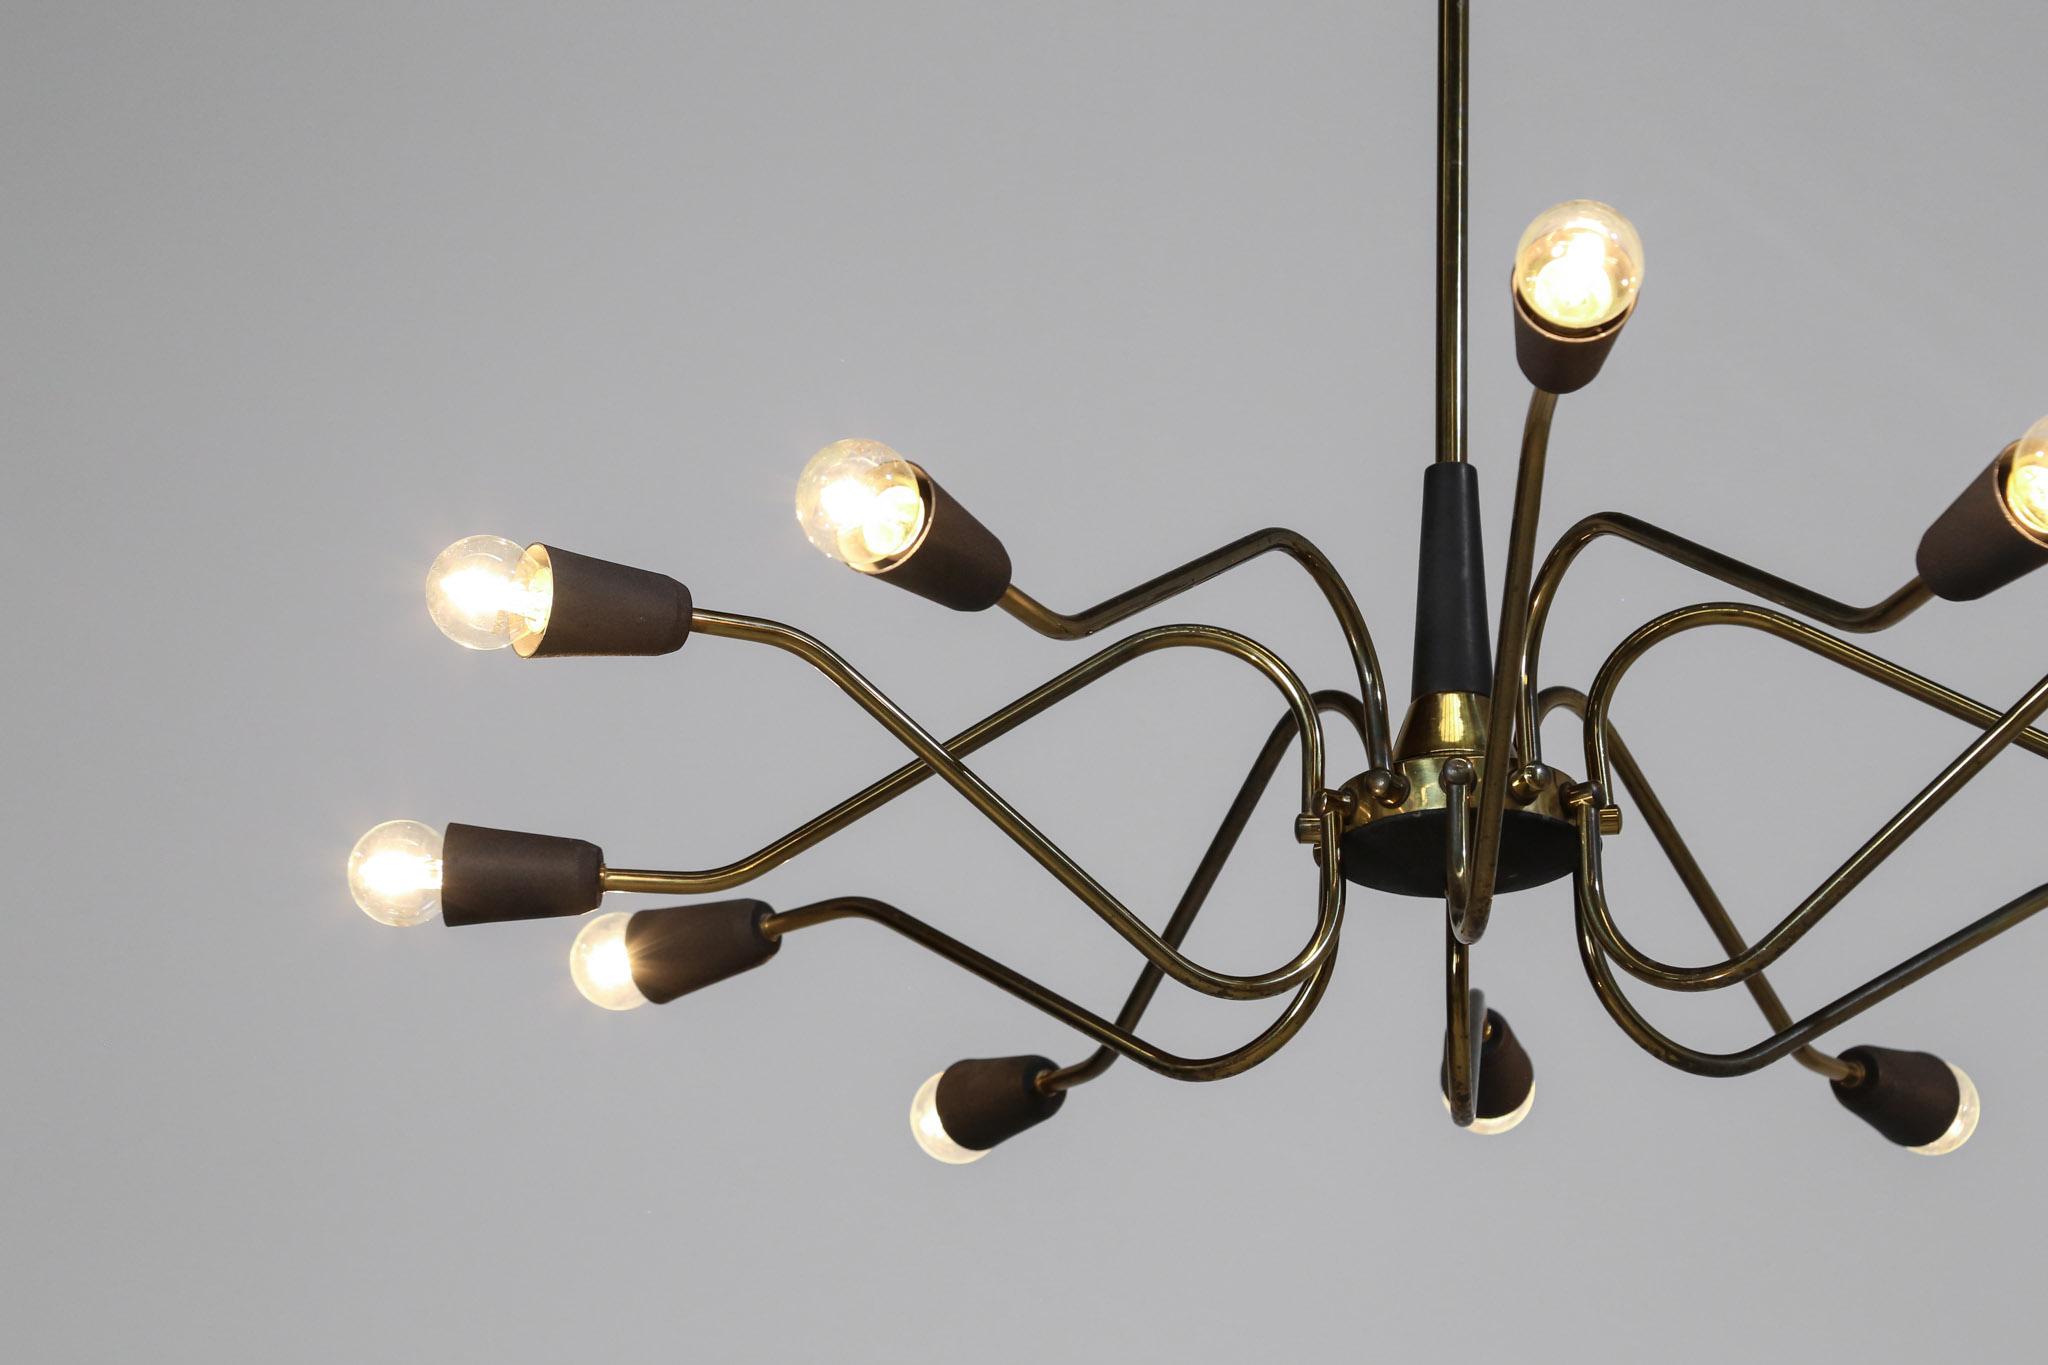 lustre italien dlg stilnovo design danke galerie. Black Bedroom Furniture Sets. Home Design Ideas